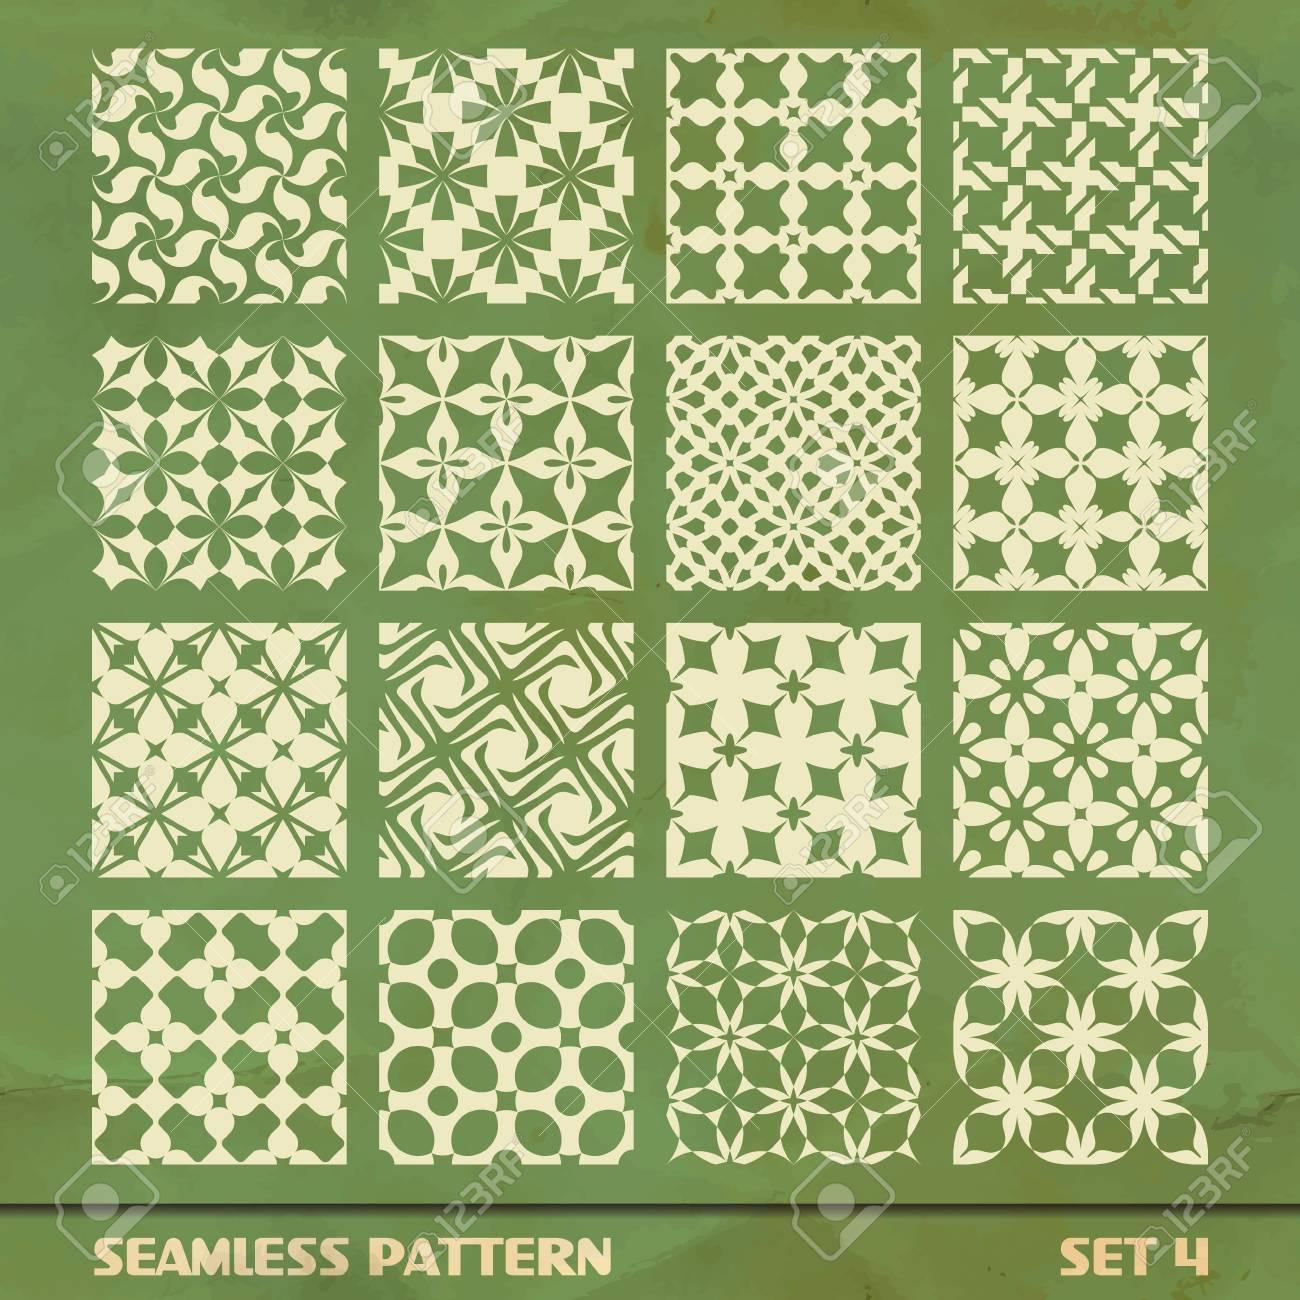 SEAMLESS PATTERN  SET 4 Stock Vector - 17431136